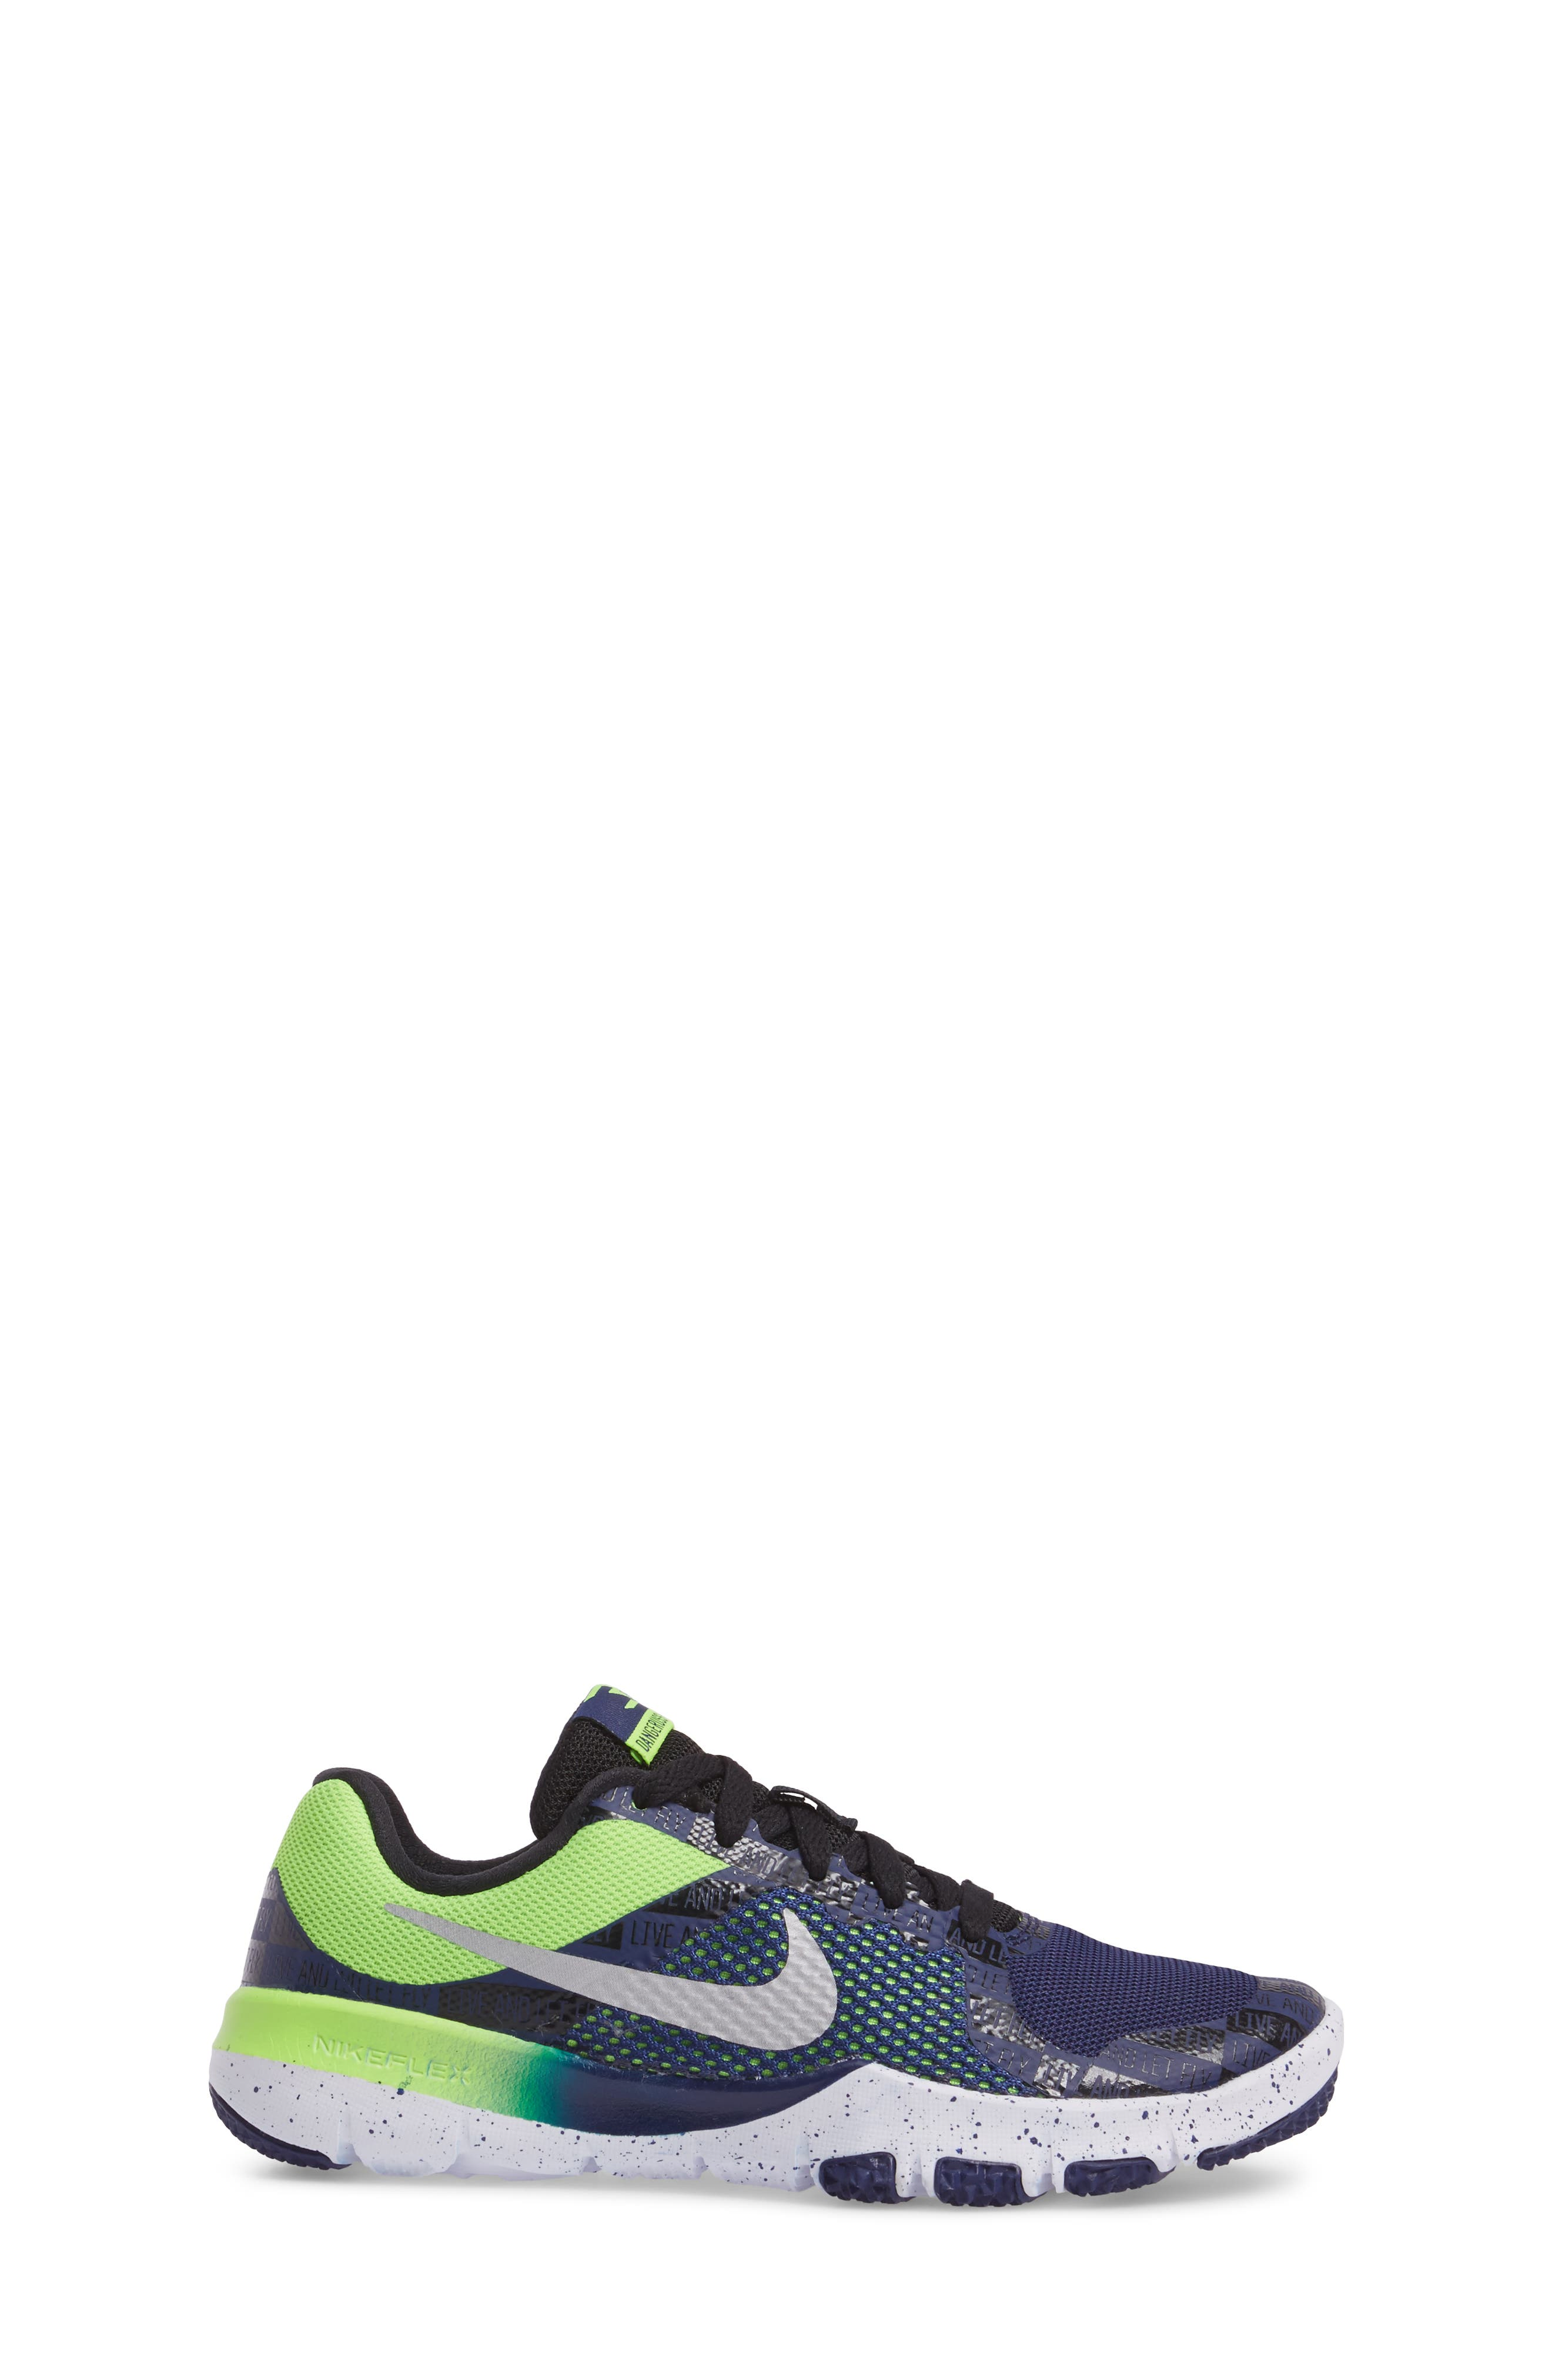 Alternate Image 3  - Nike Flex TR Control Training Shoe (Toddler, Little Kid & Big Kid)